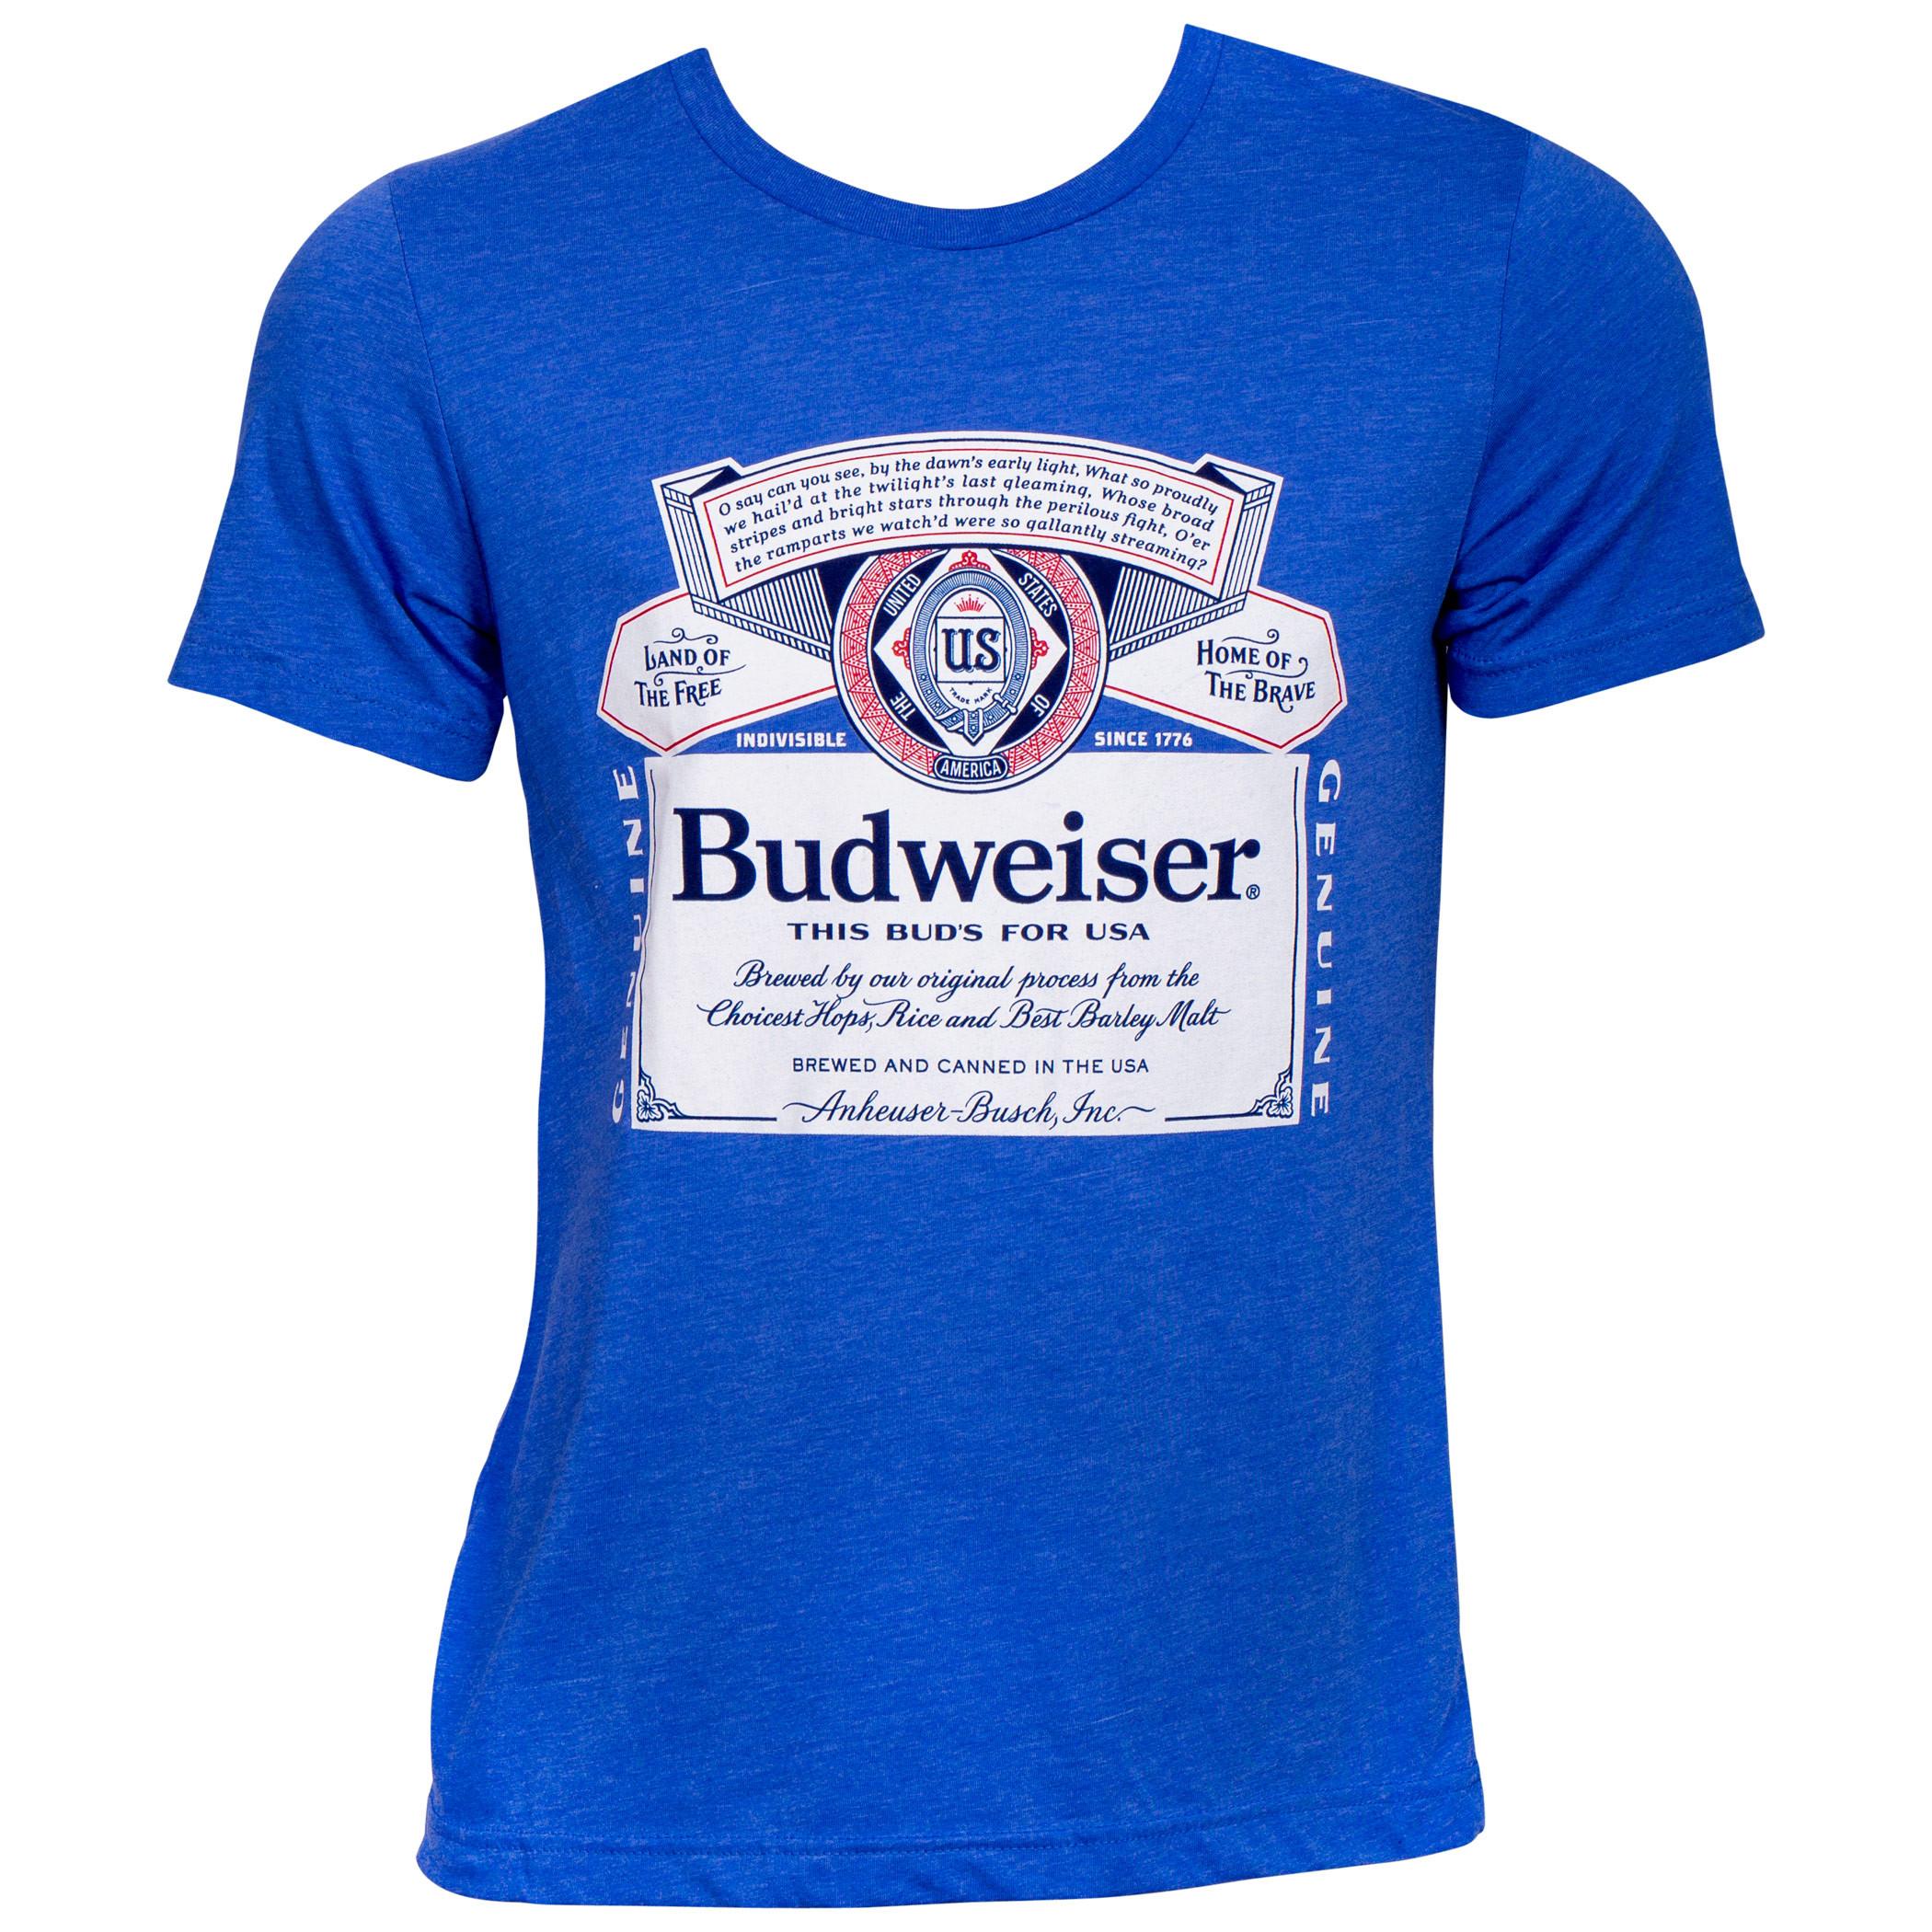 Budweiser Beer Patriotic Label Blue T-Shirt